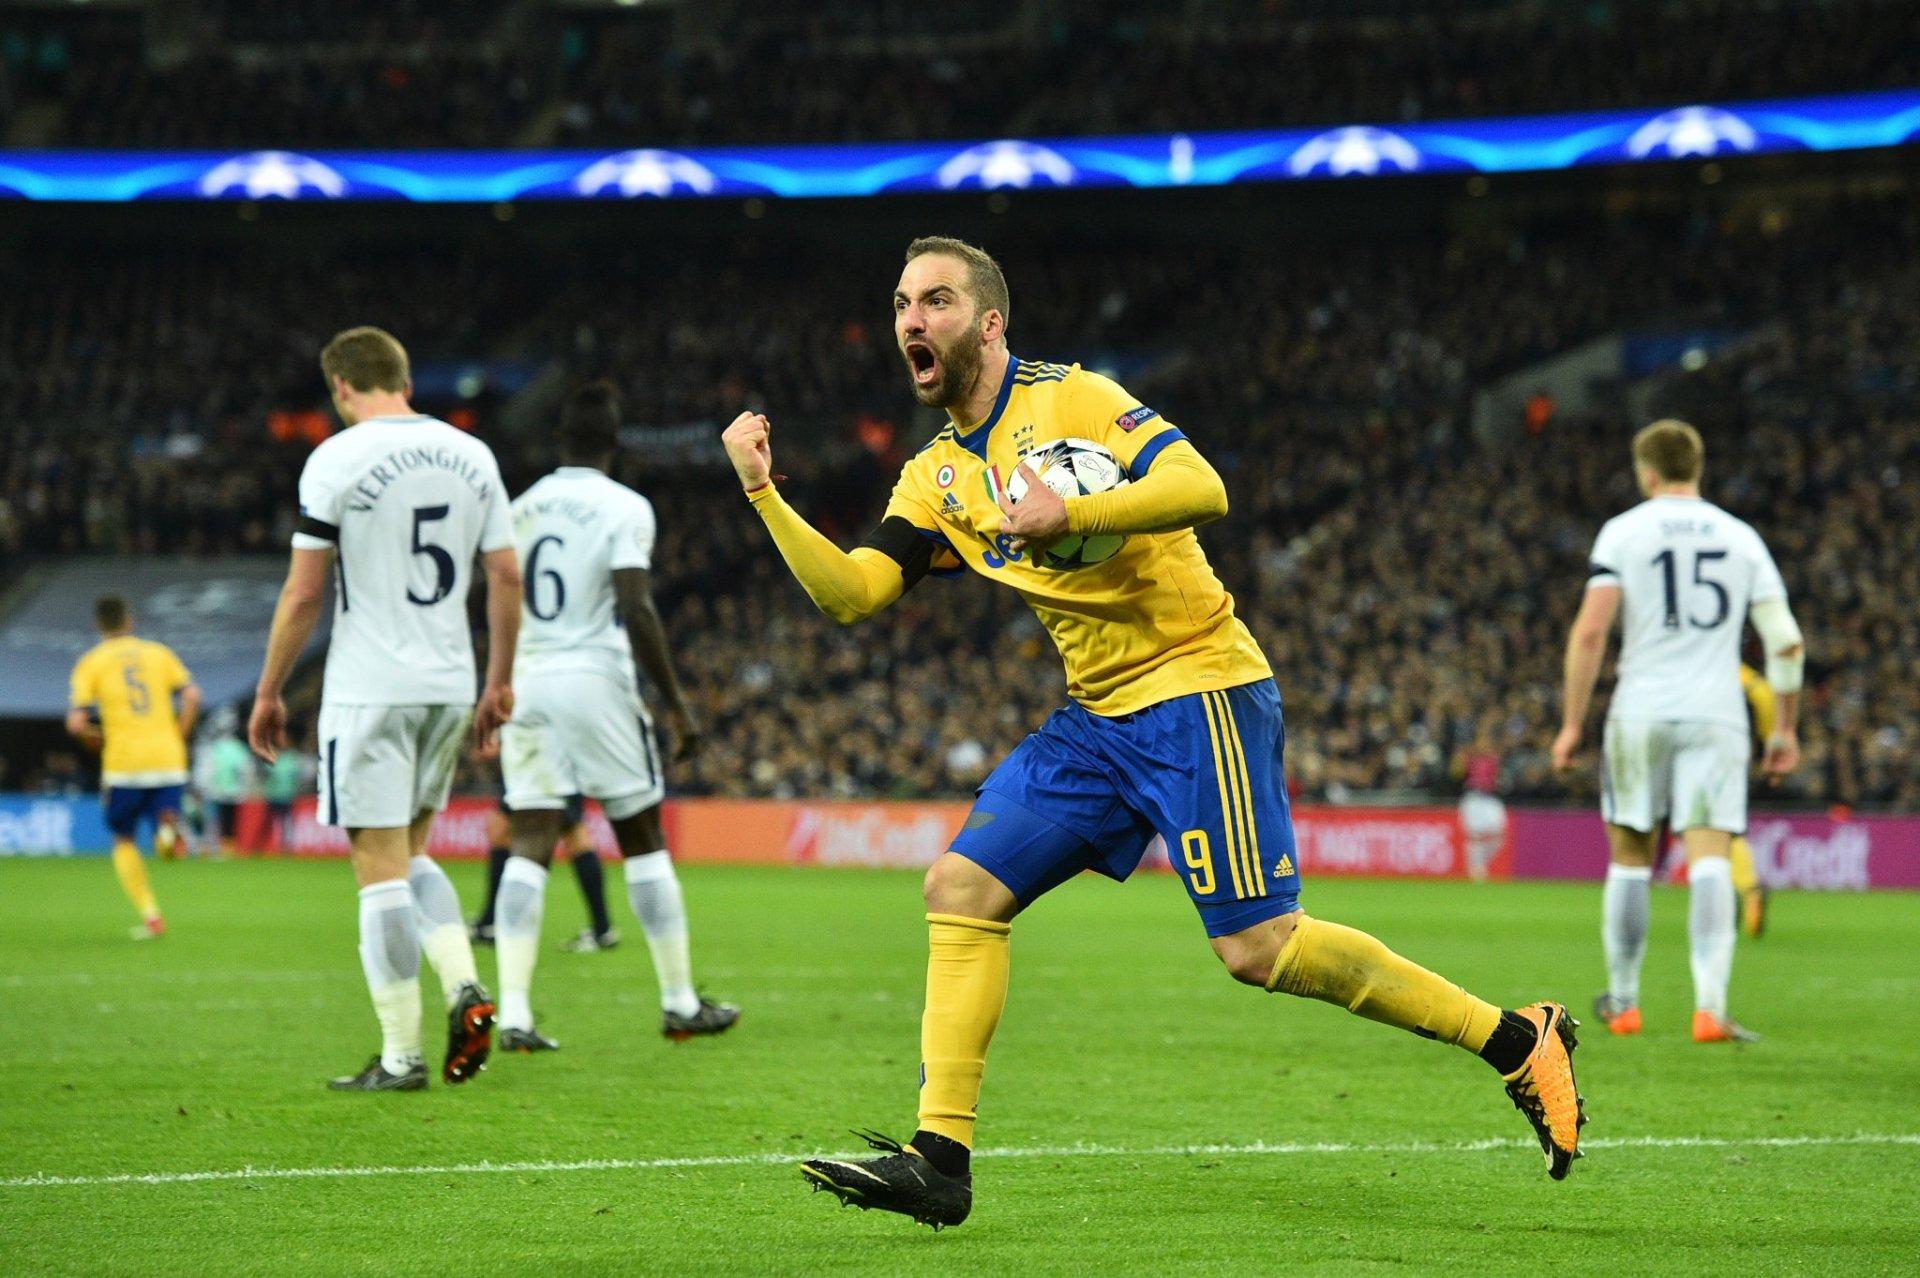 UCL: Juve Stun Spurs At Wembley, Man City Advance Despite Basel Defeat